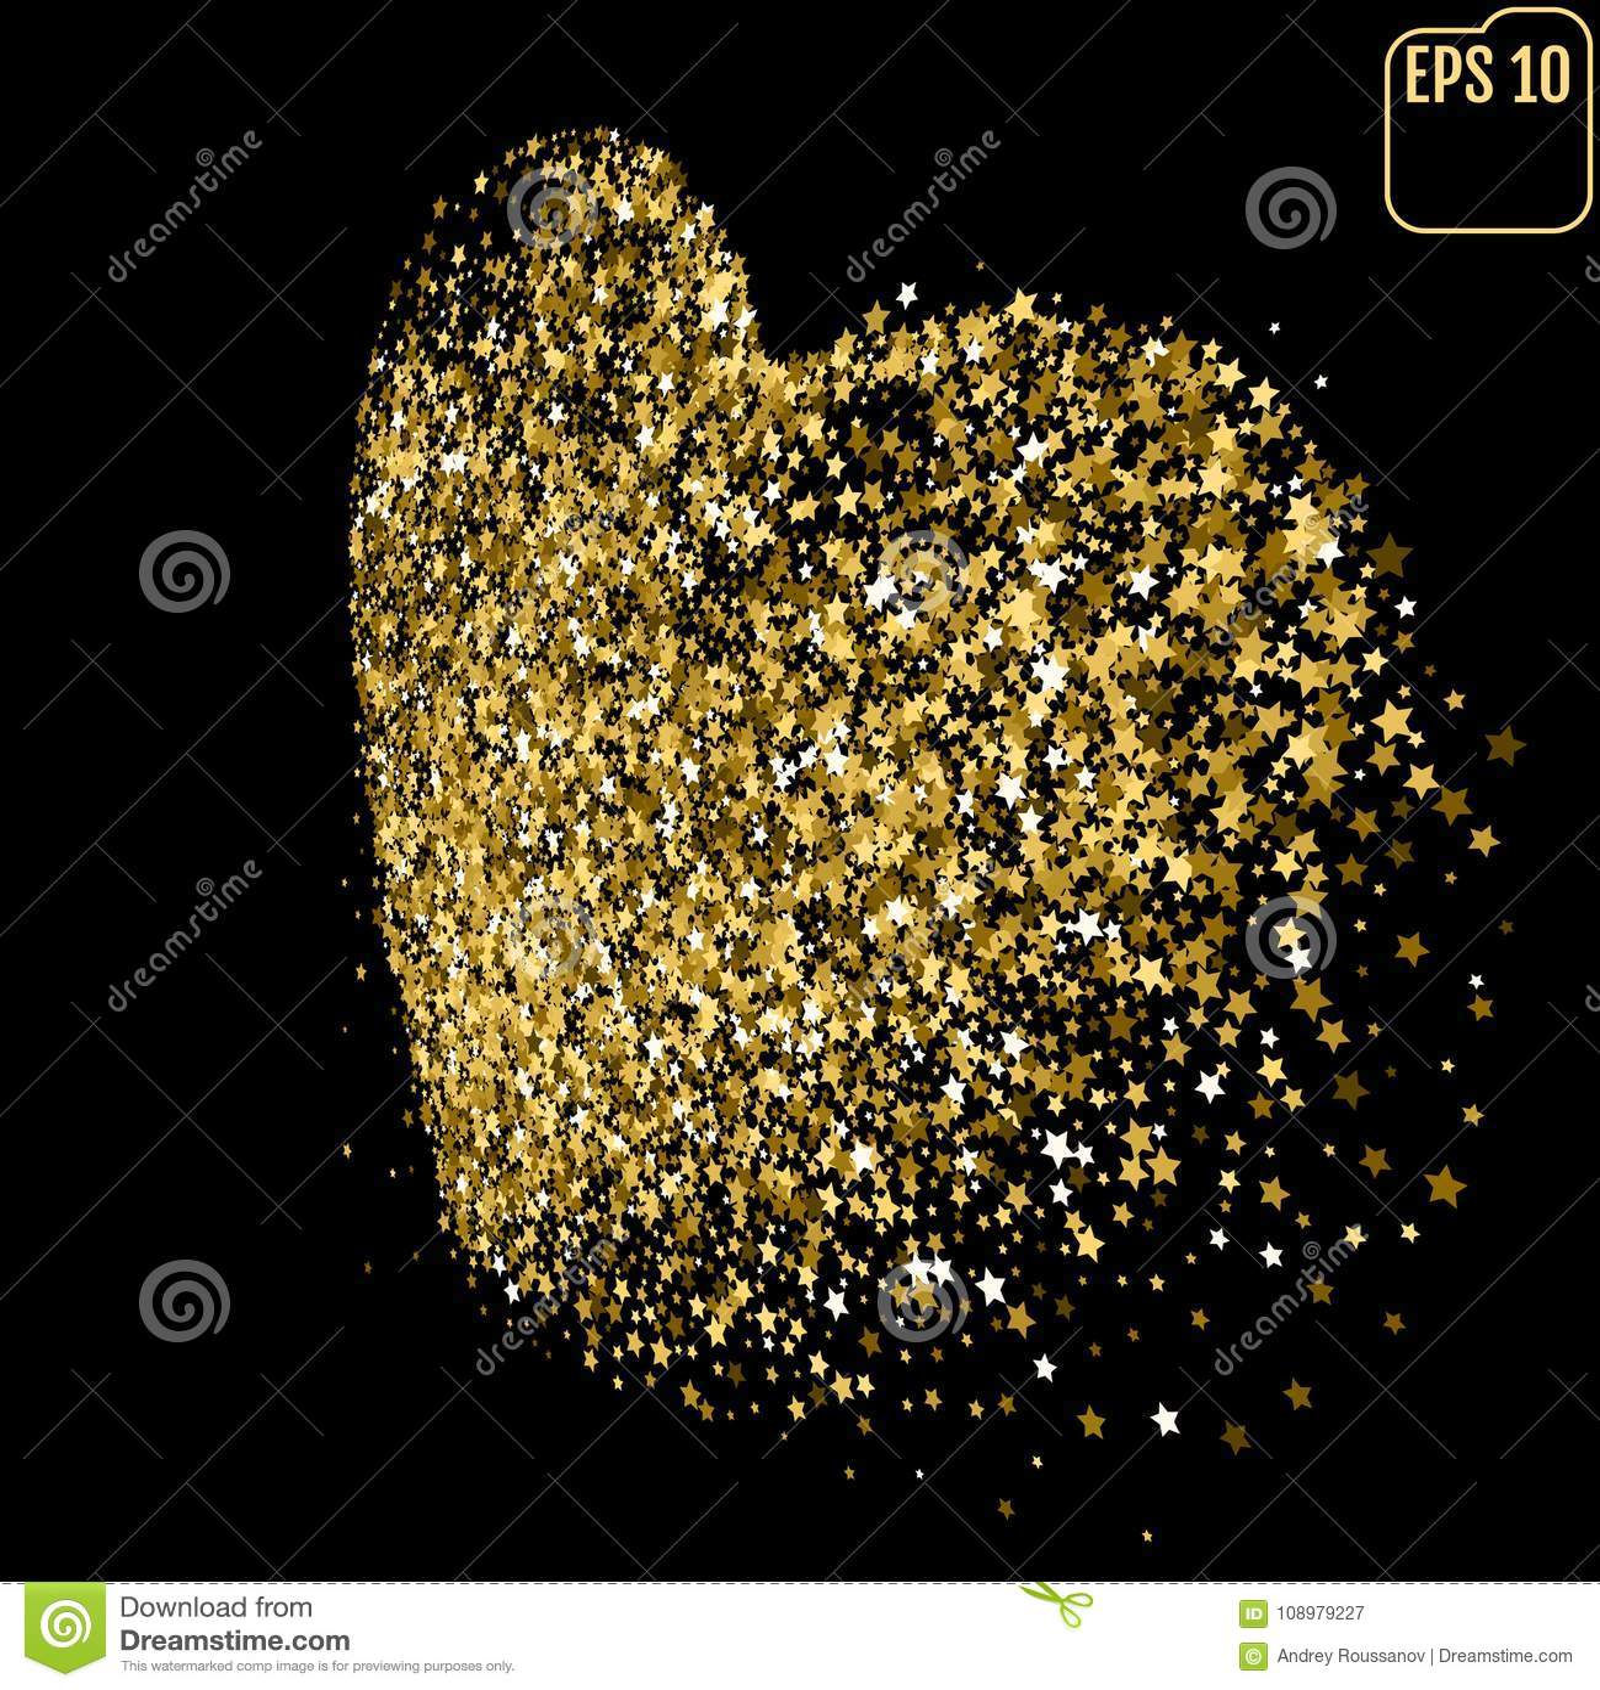 Shimmering Stars Confetti Heart  Greeting Card, Wedding